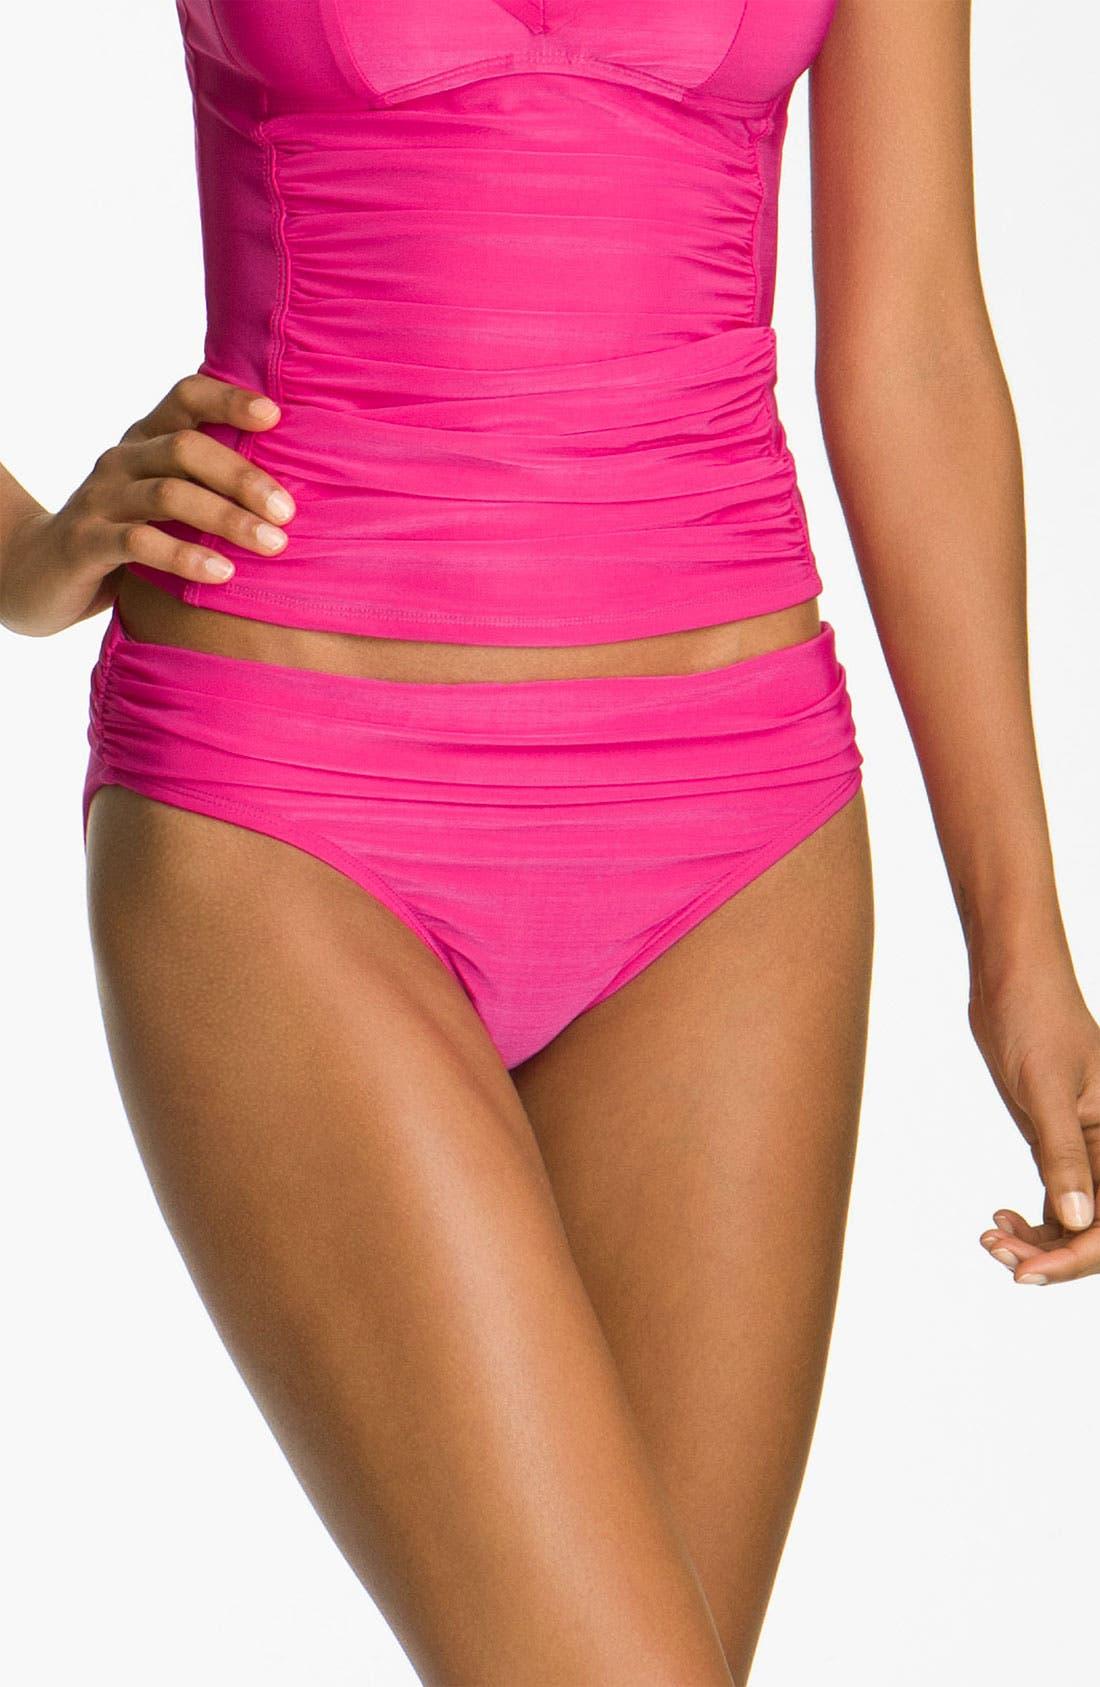 Alternate Image 1 Selected - La Blanca 'Diabolo' Hipster Bikini Bottoms